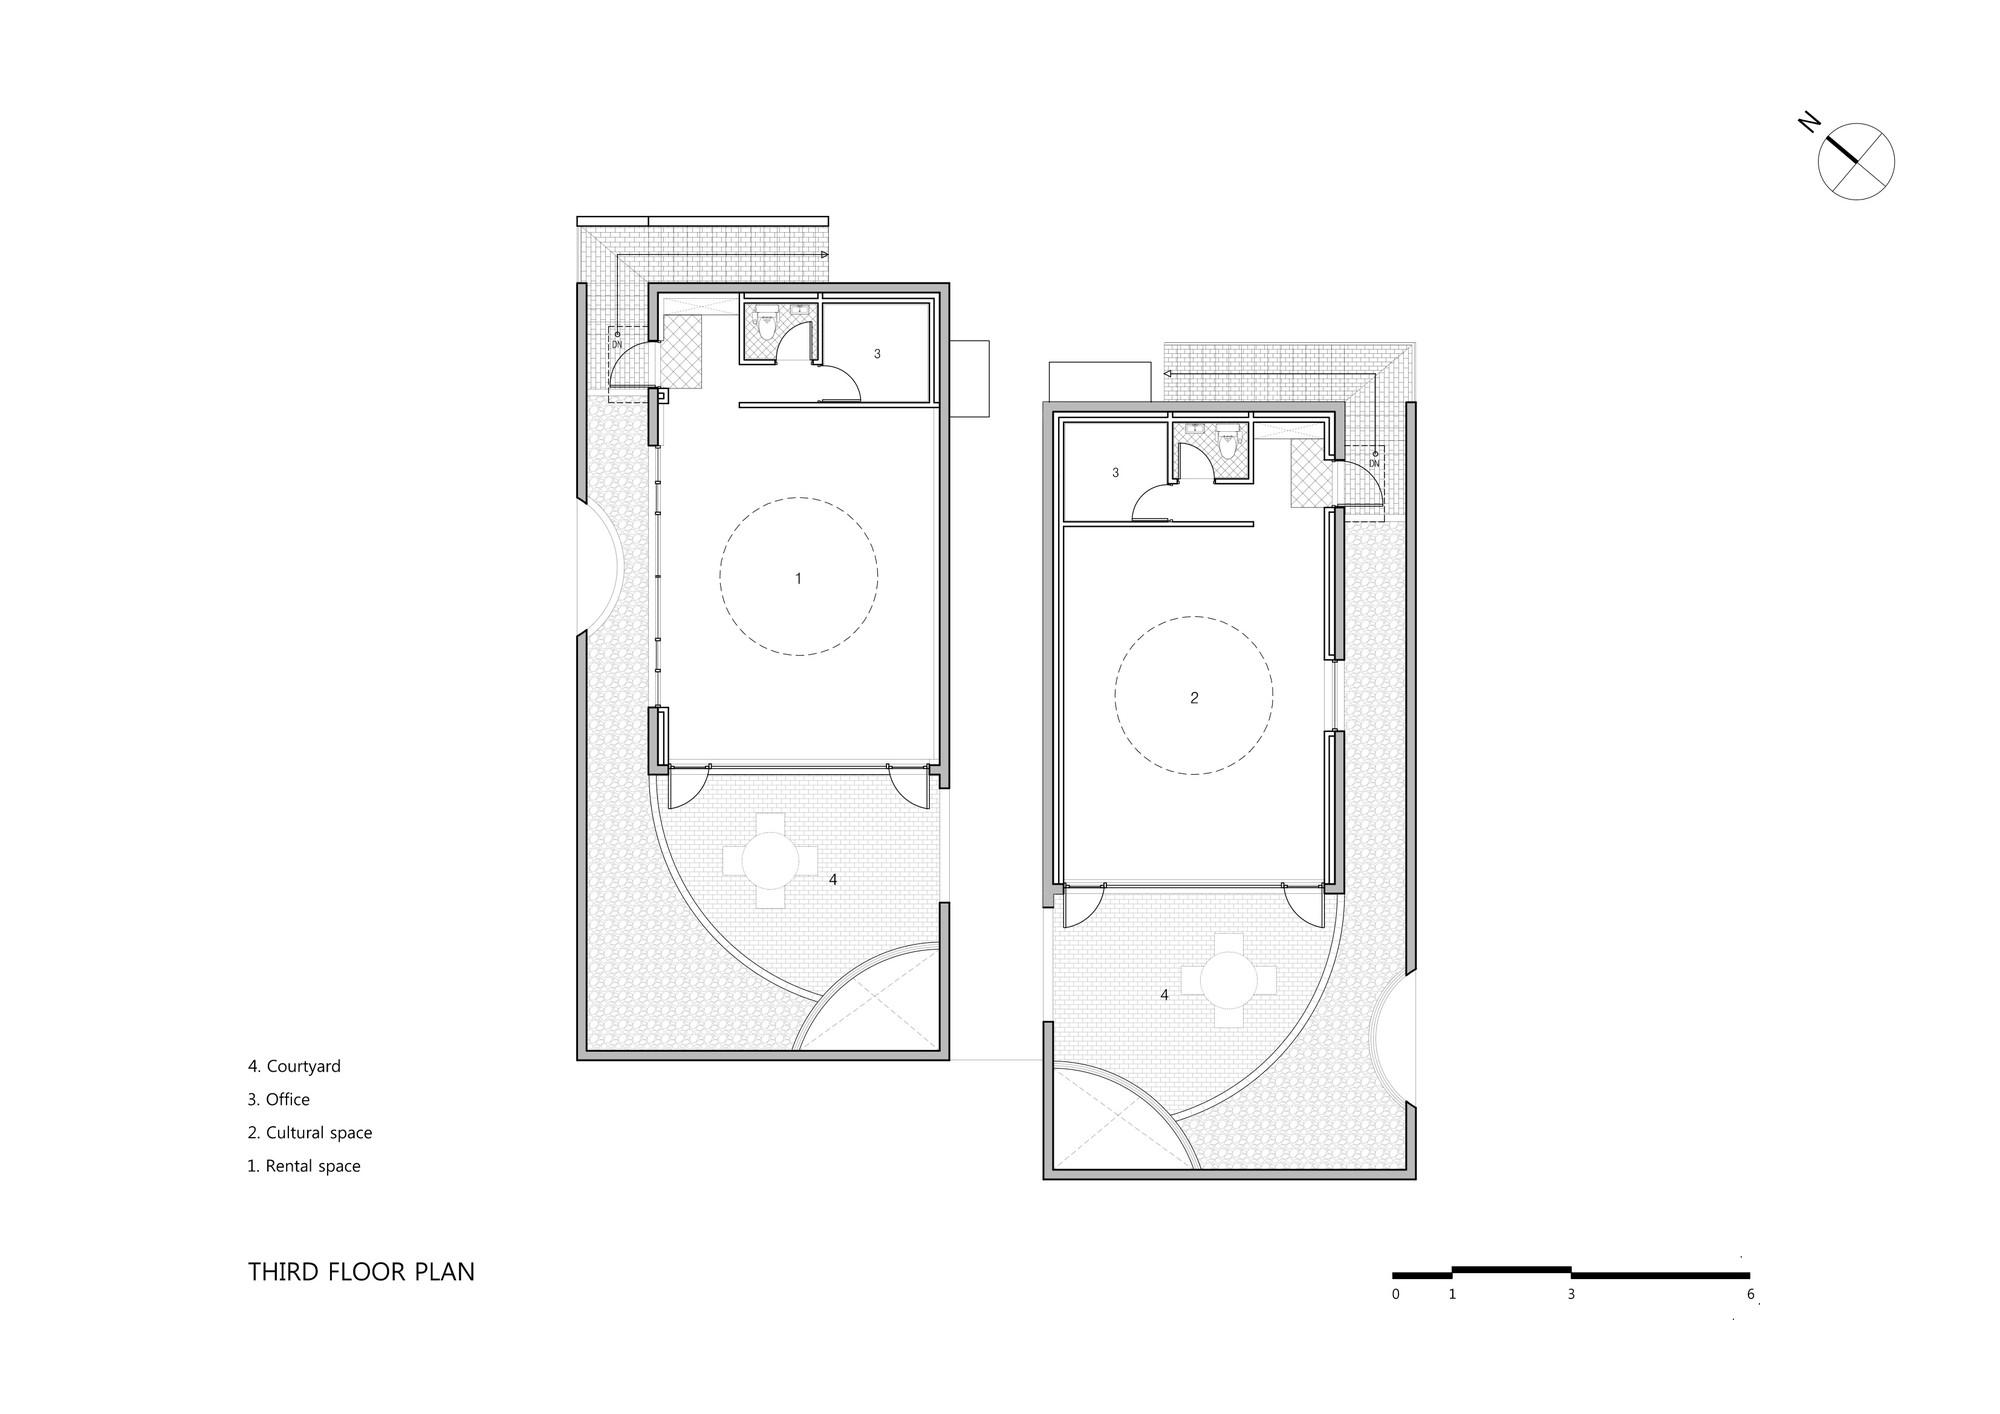 33_Third_Floor_Plan.jpg